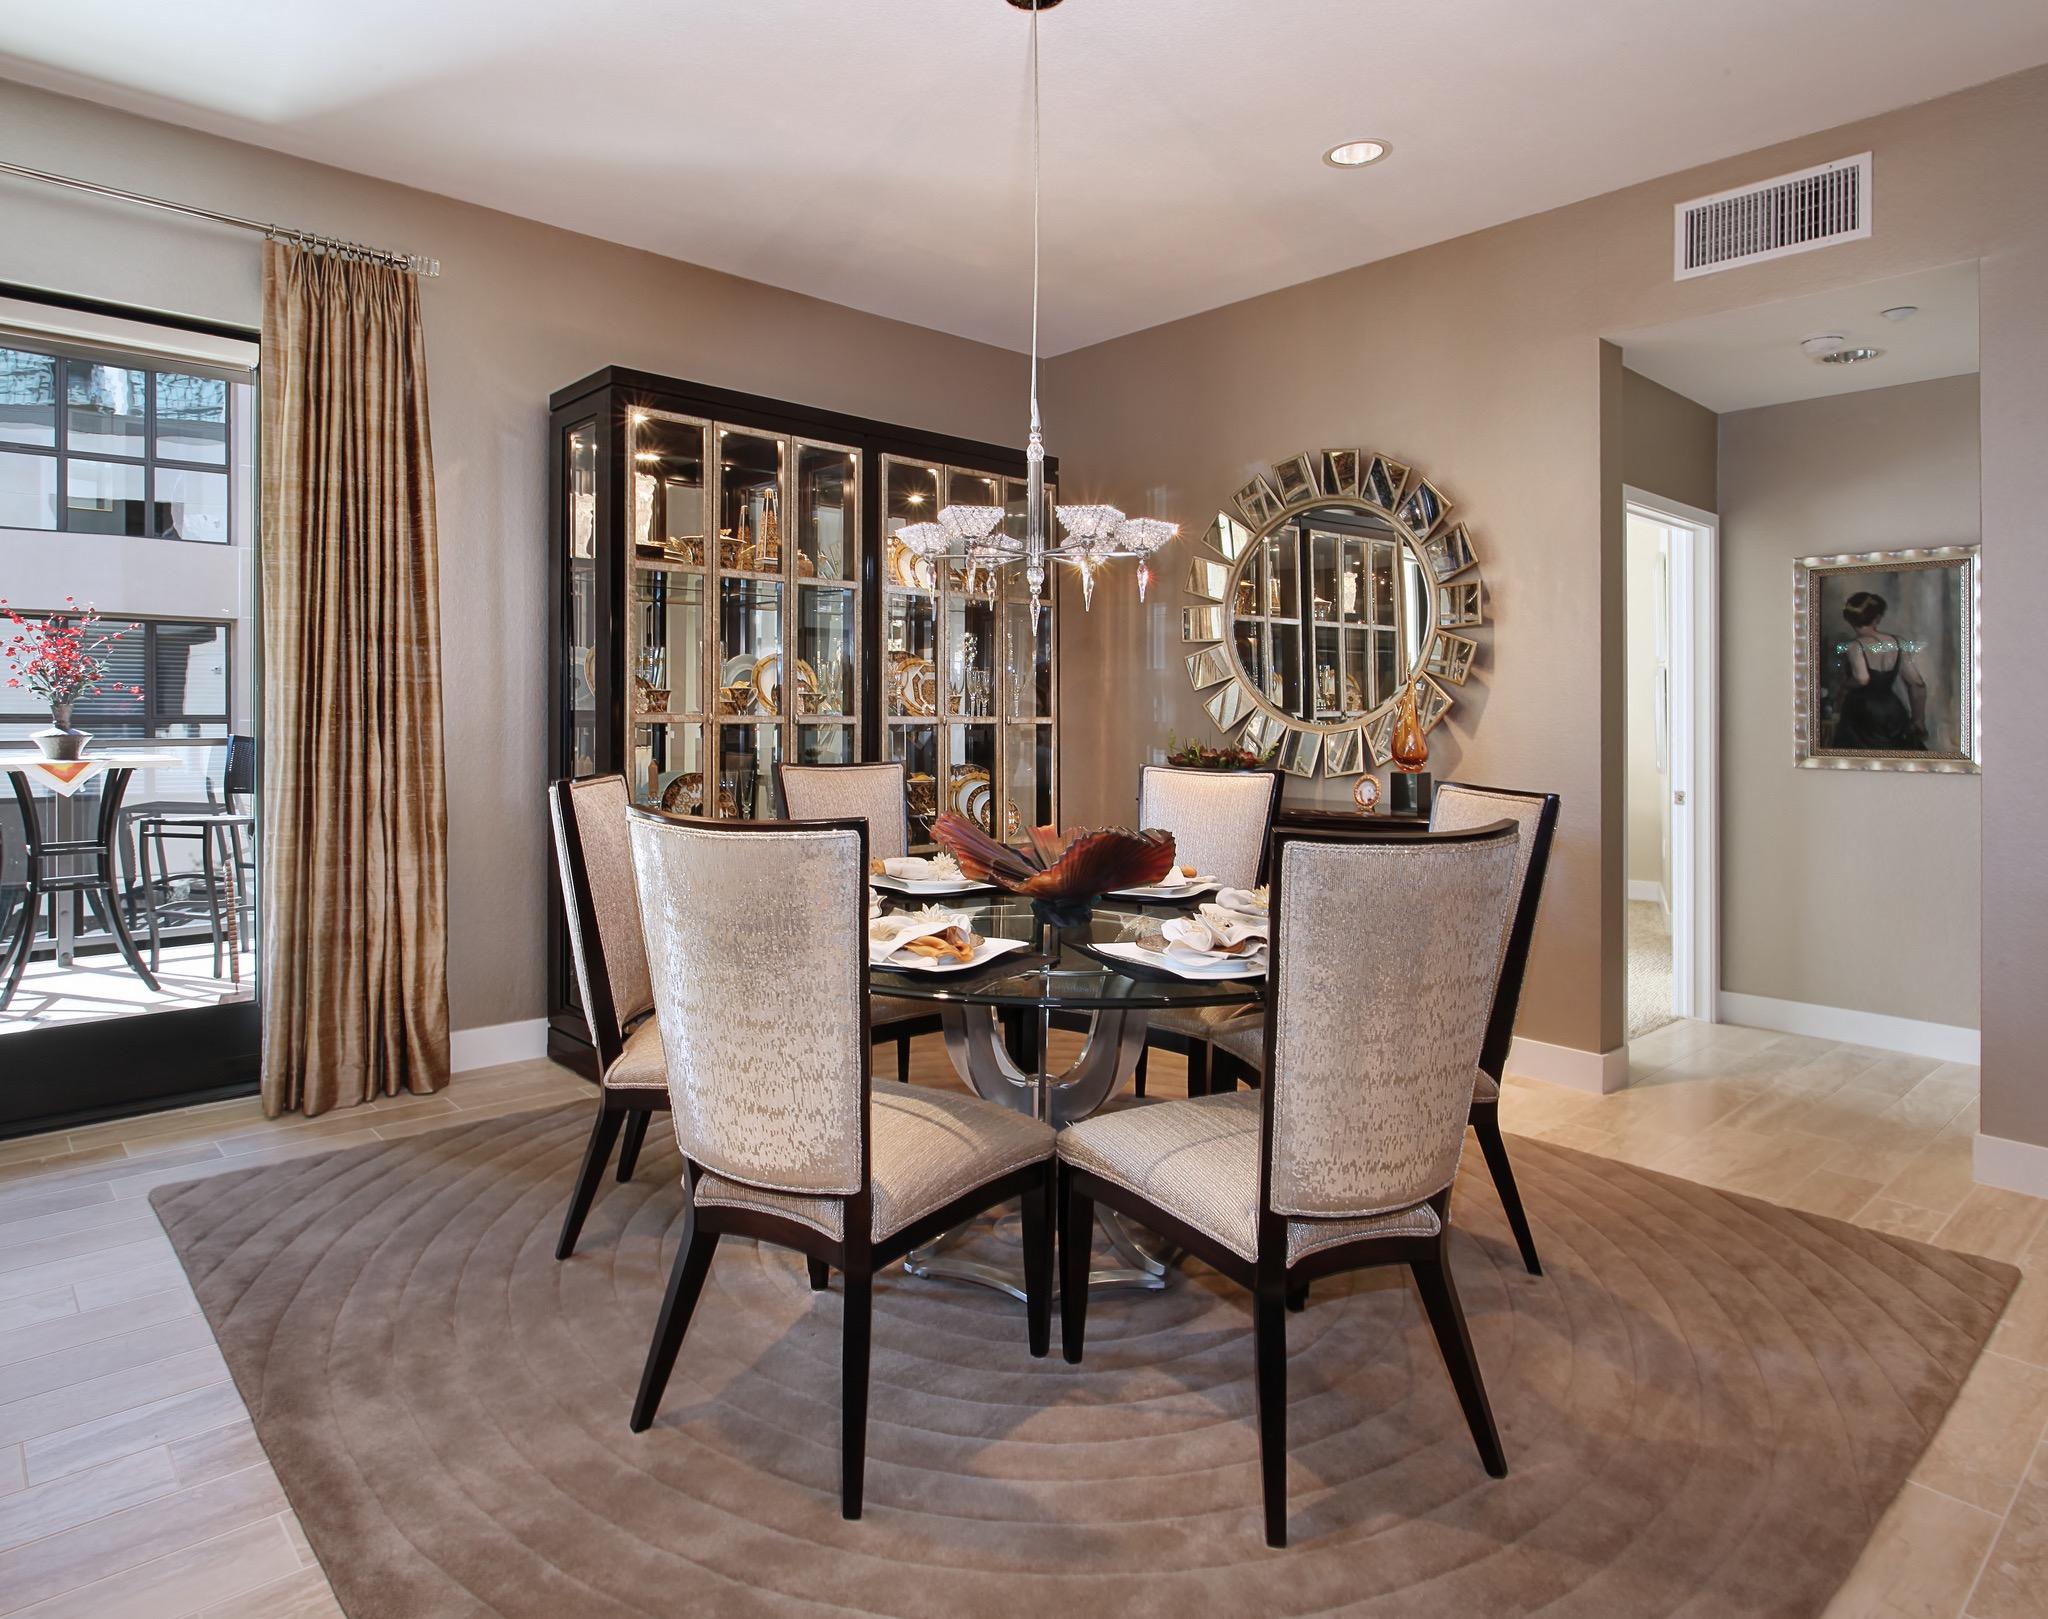 30 Best Formal Dining Room Design And Decor Ideas #828 | Dining Room Ideas